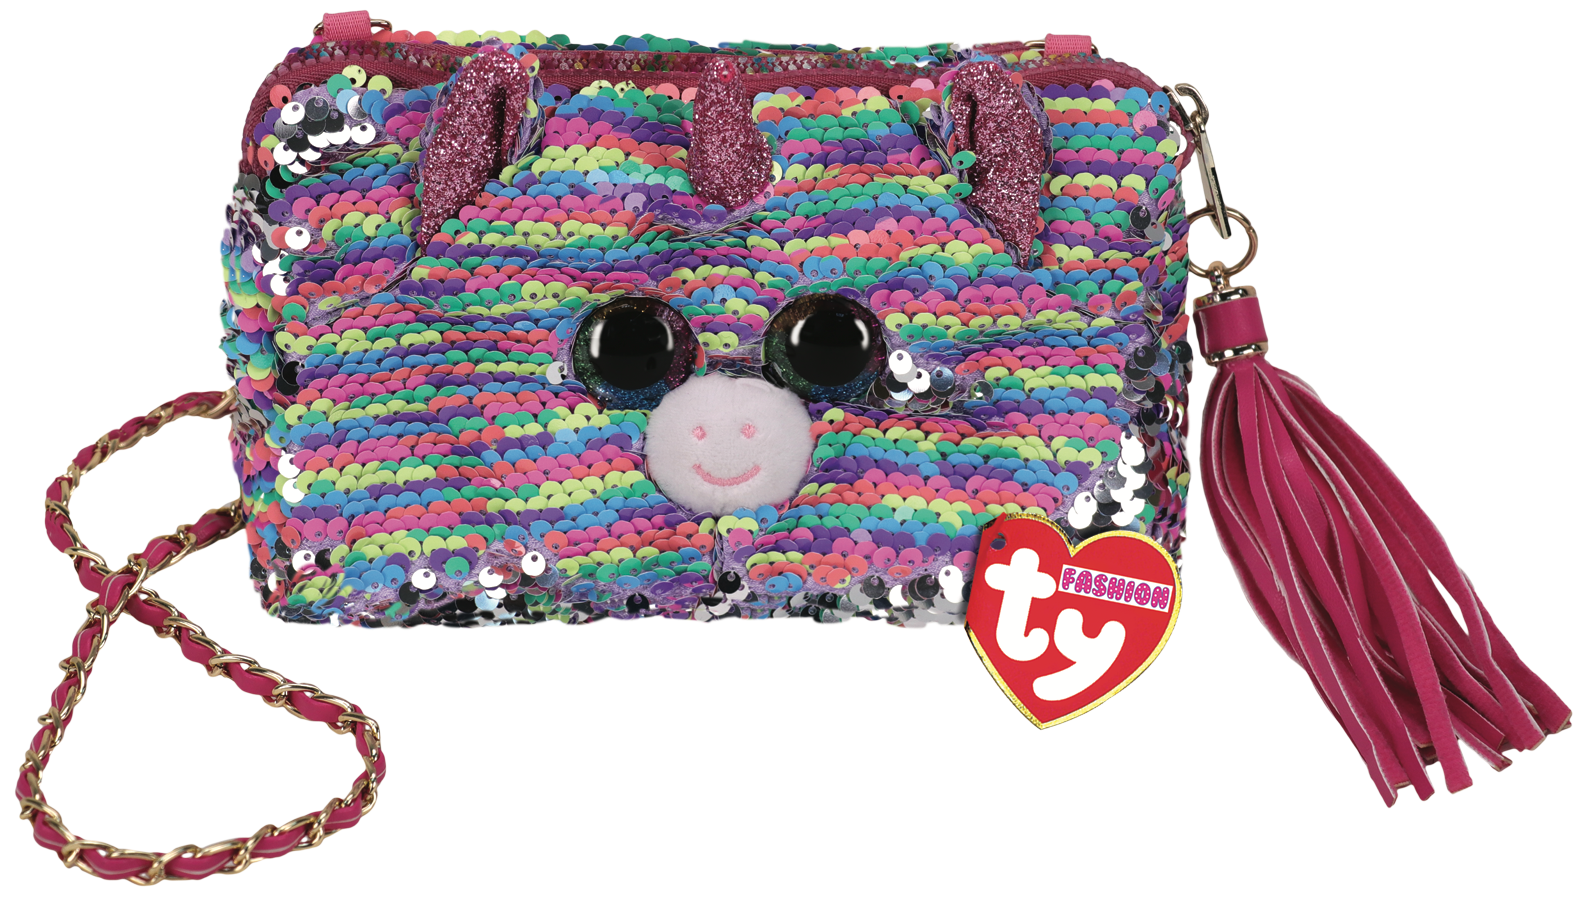 Ty Plush - Sequin Square Purse - Elise the Rainbow Unicorn (TY95143)